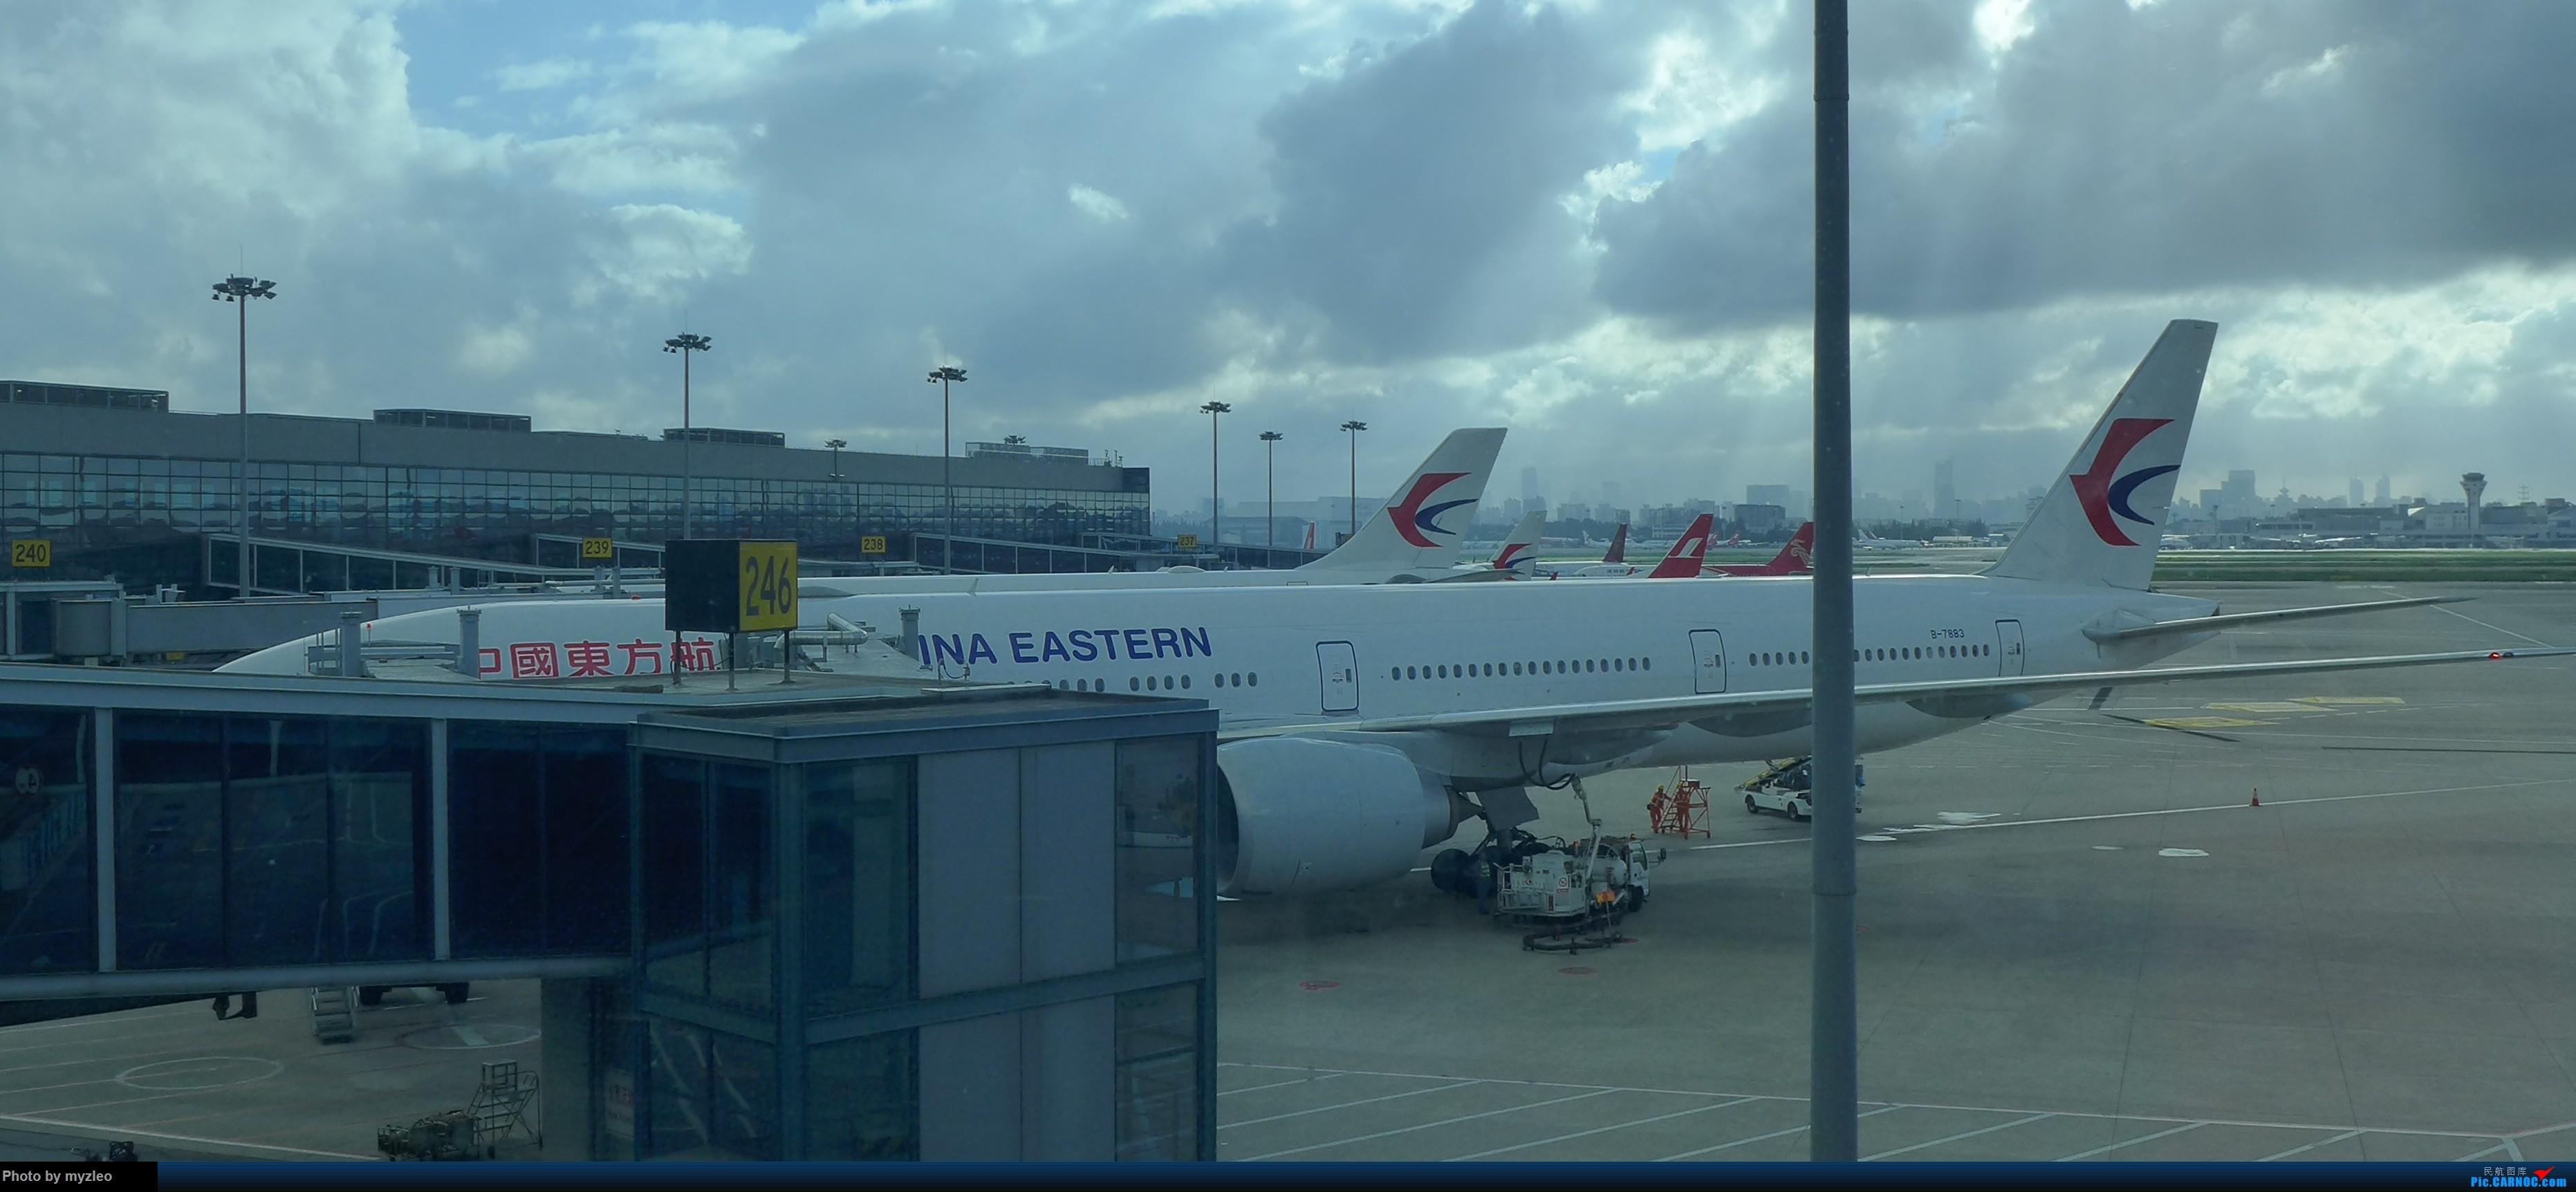 Re:[原创]【myzleo的游记3.1】三访帝都——记一次意外的惊喜,大鹅头初遇,第一次去中关村 BOEING 777-300ER B-7883 中国上海虹桥国际机场